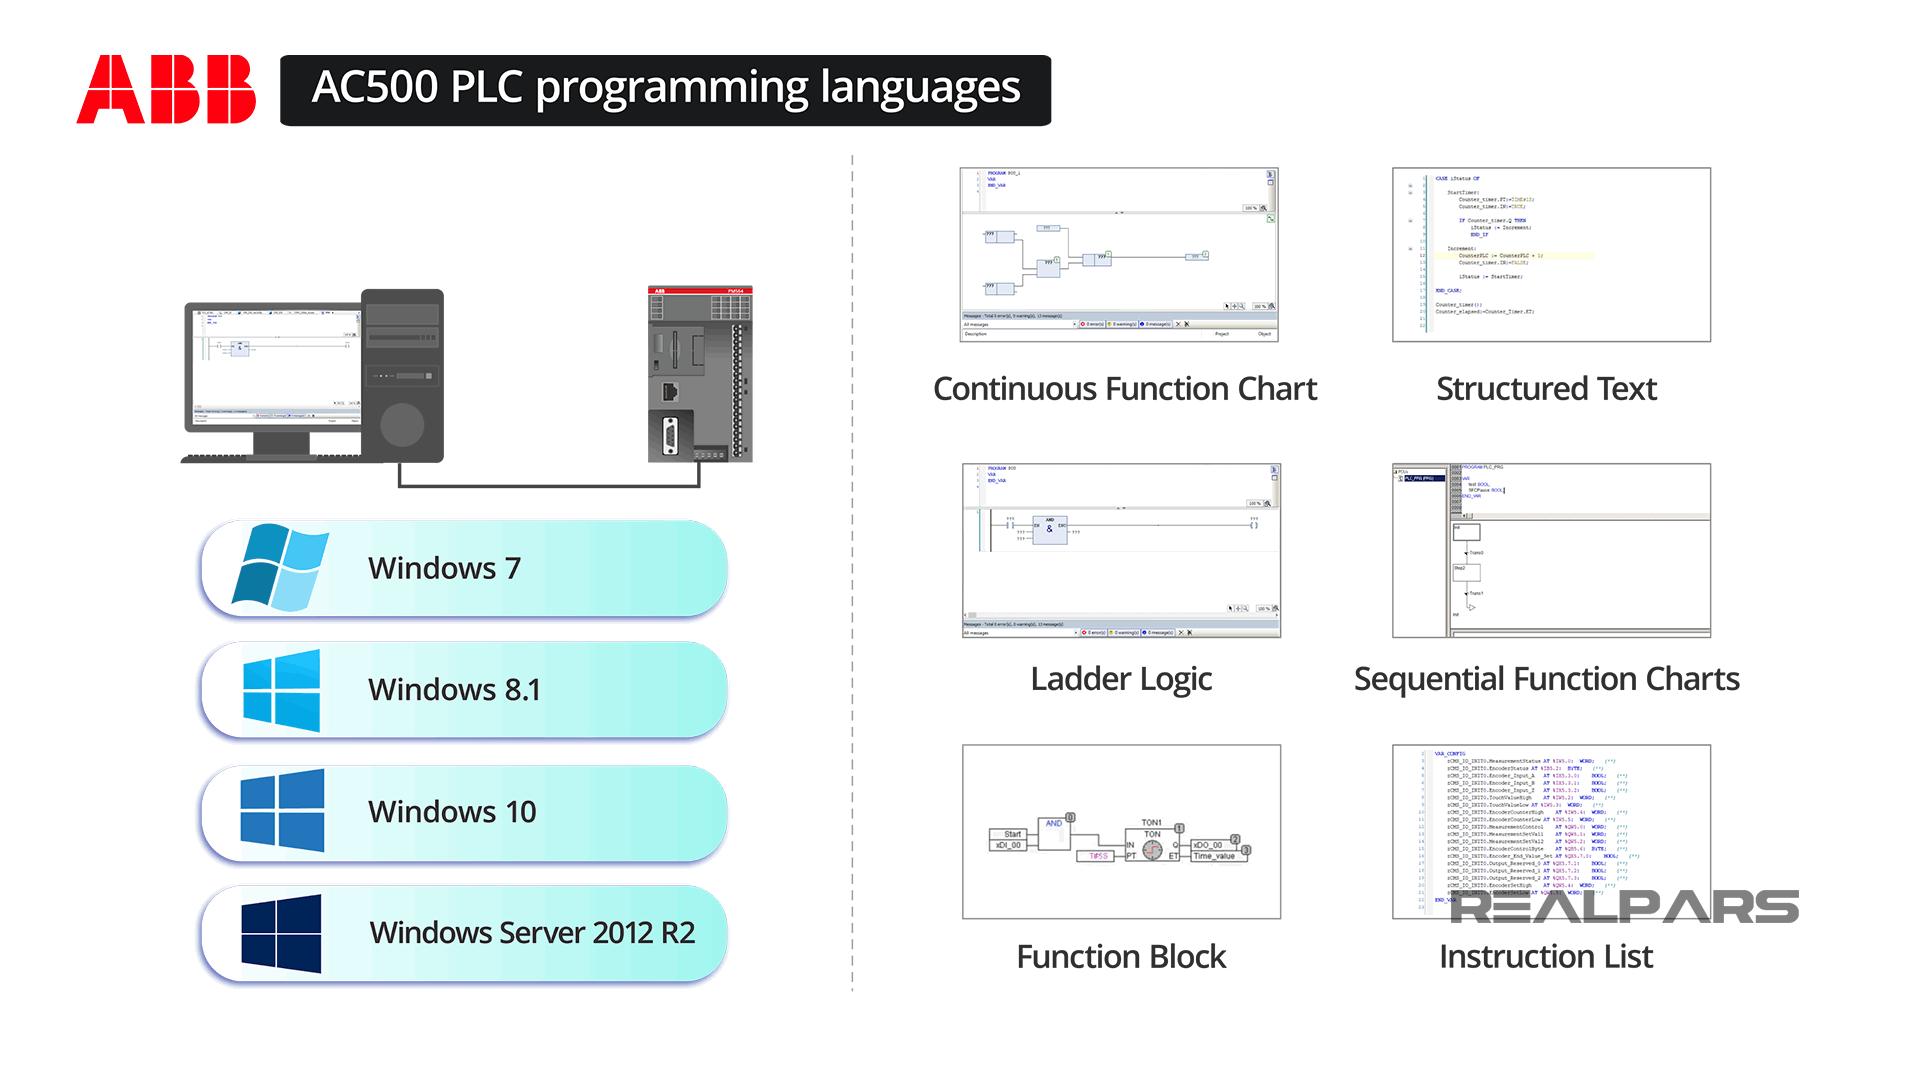 ABB AC500 Programming